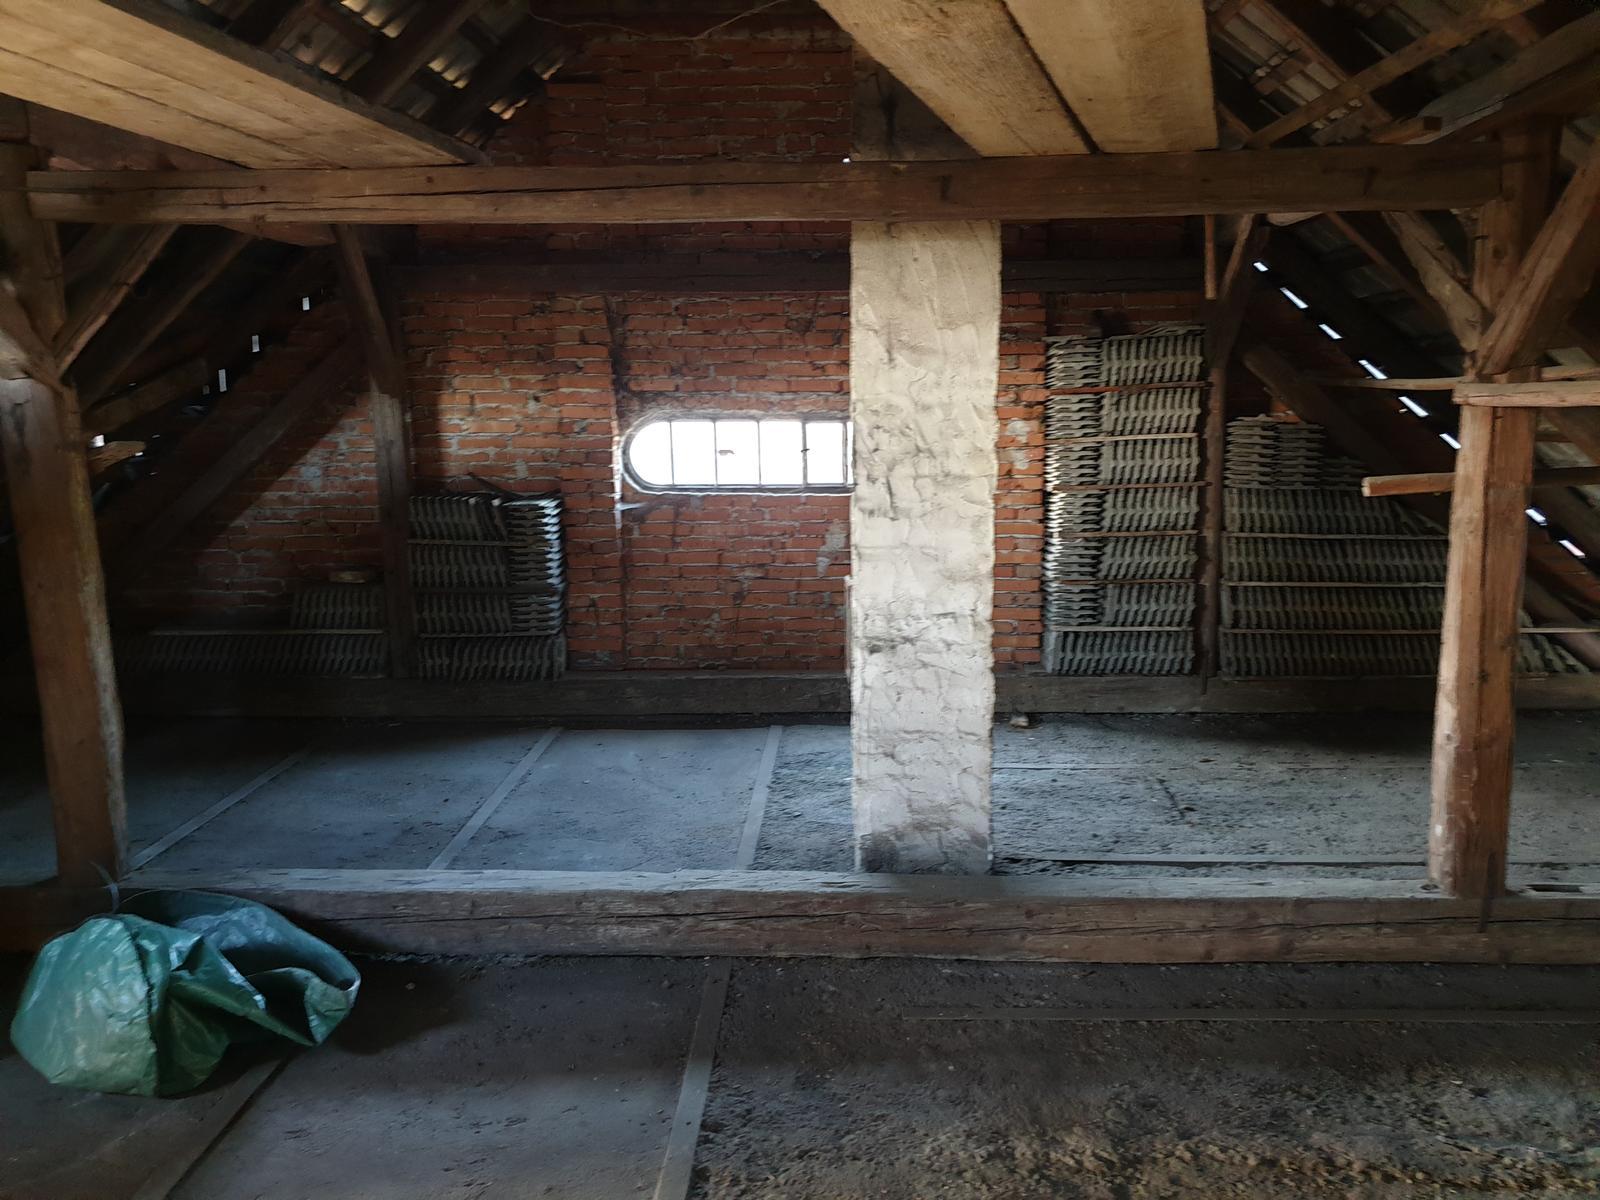 Rekonštrukcia domu-alebo chceme si splniť sen =》🏠🌻🌼🐶  mat domcek a vratit sa na Slovensko - tu som makala ked mi prihorel obed :-D ... ale pohlad na spalnu a kupelnu :)